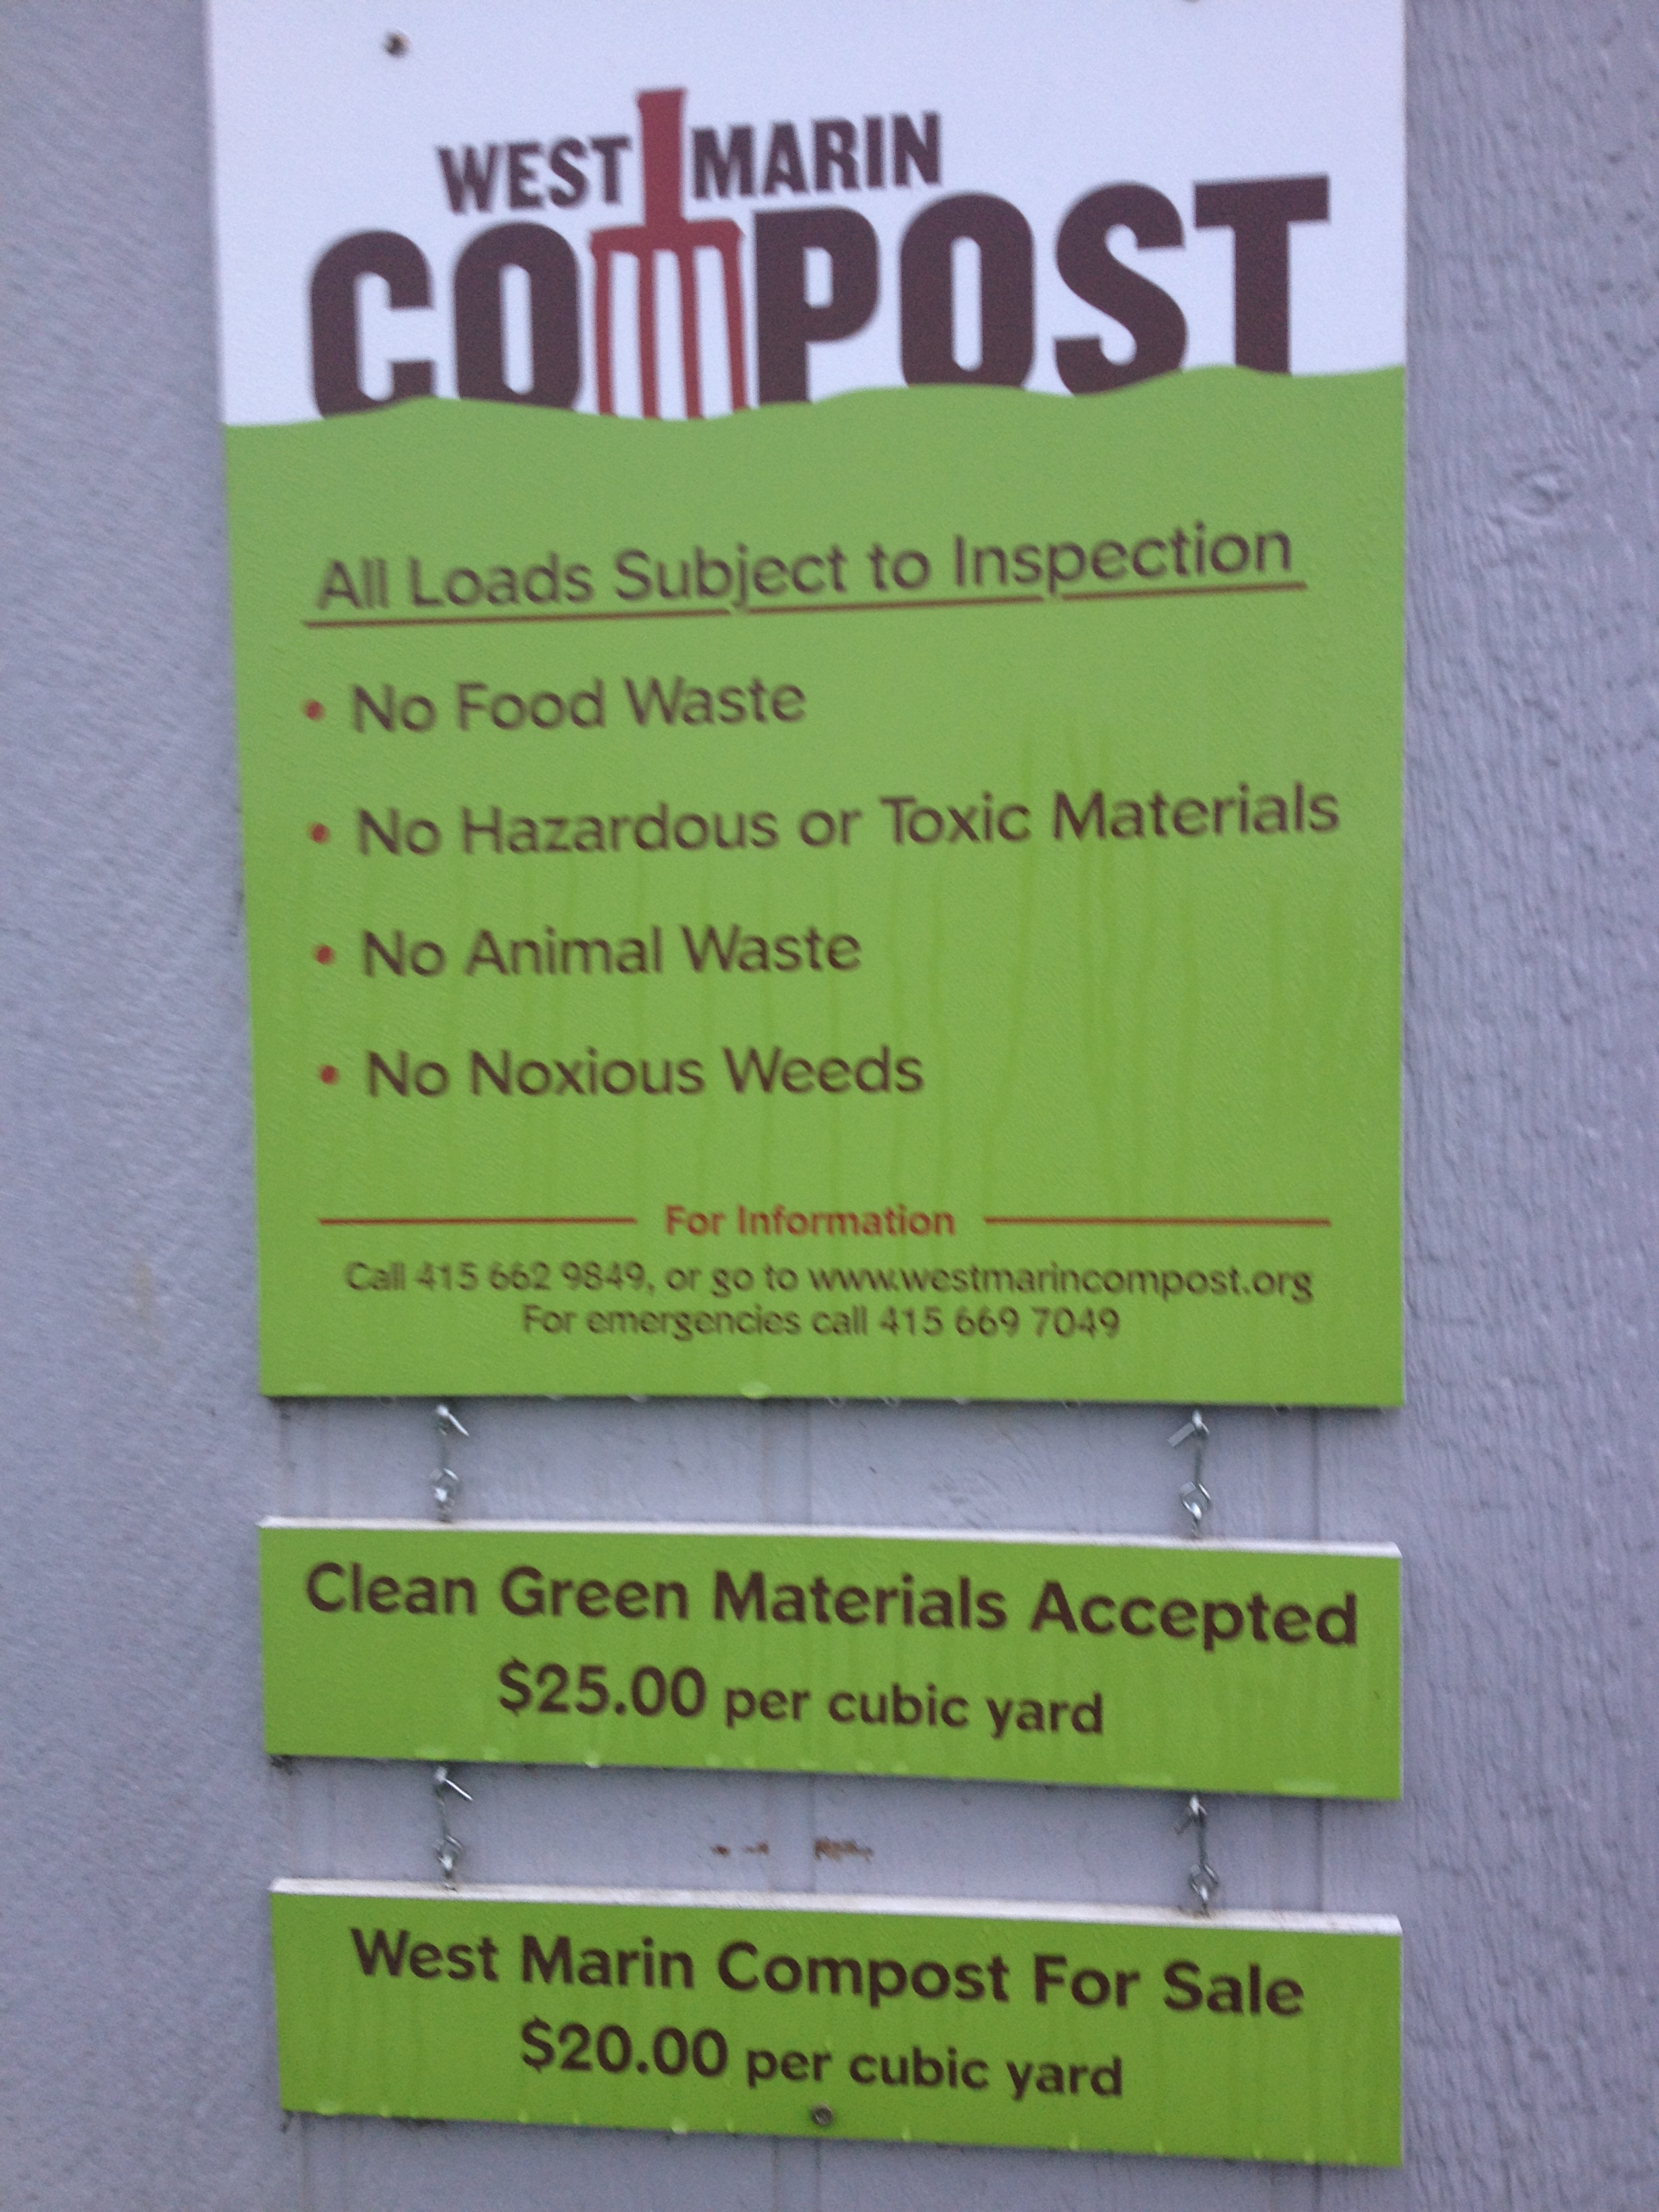 West Marin Co-Composting Program | Marin RCD